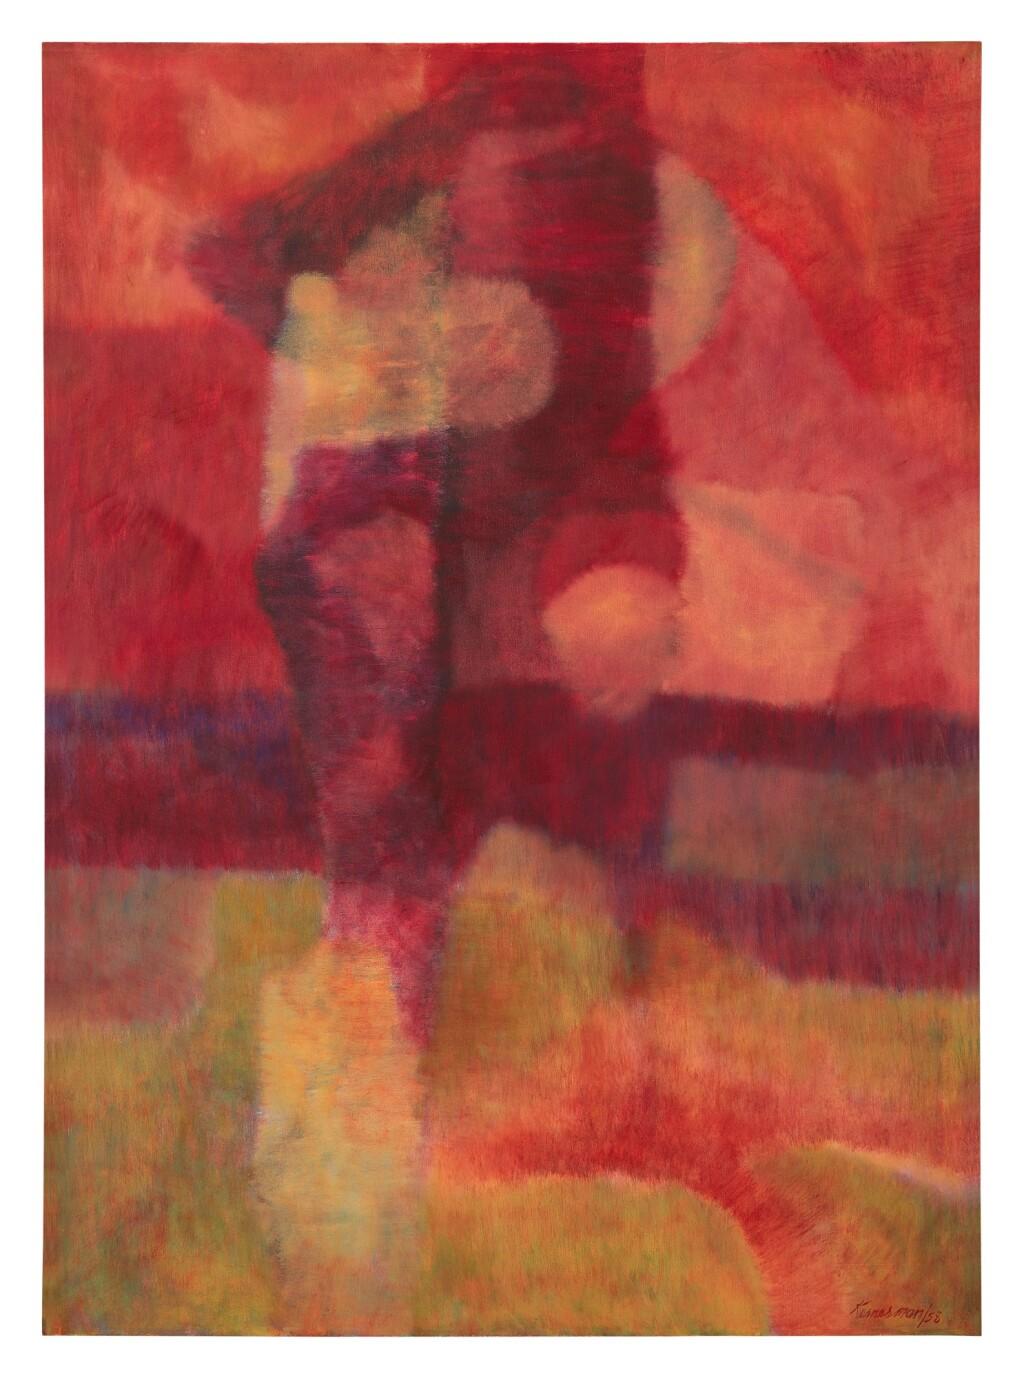 BARRY KERNERMAN | RED FIGURE IN A RED LANDSCAPE